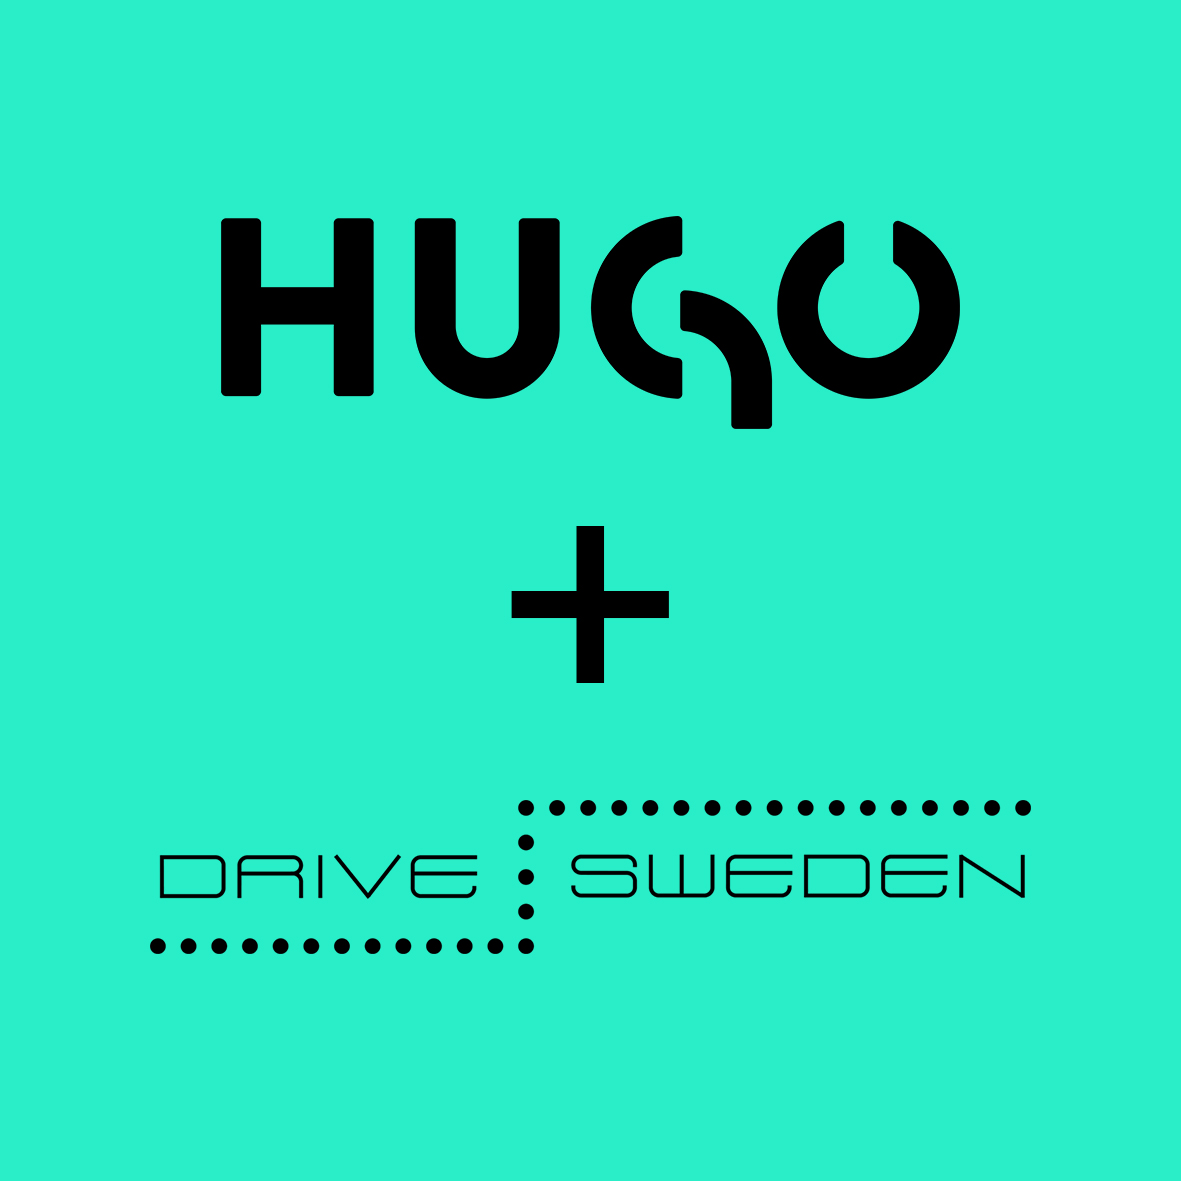 drive sweden - social media post.jpg